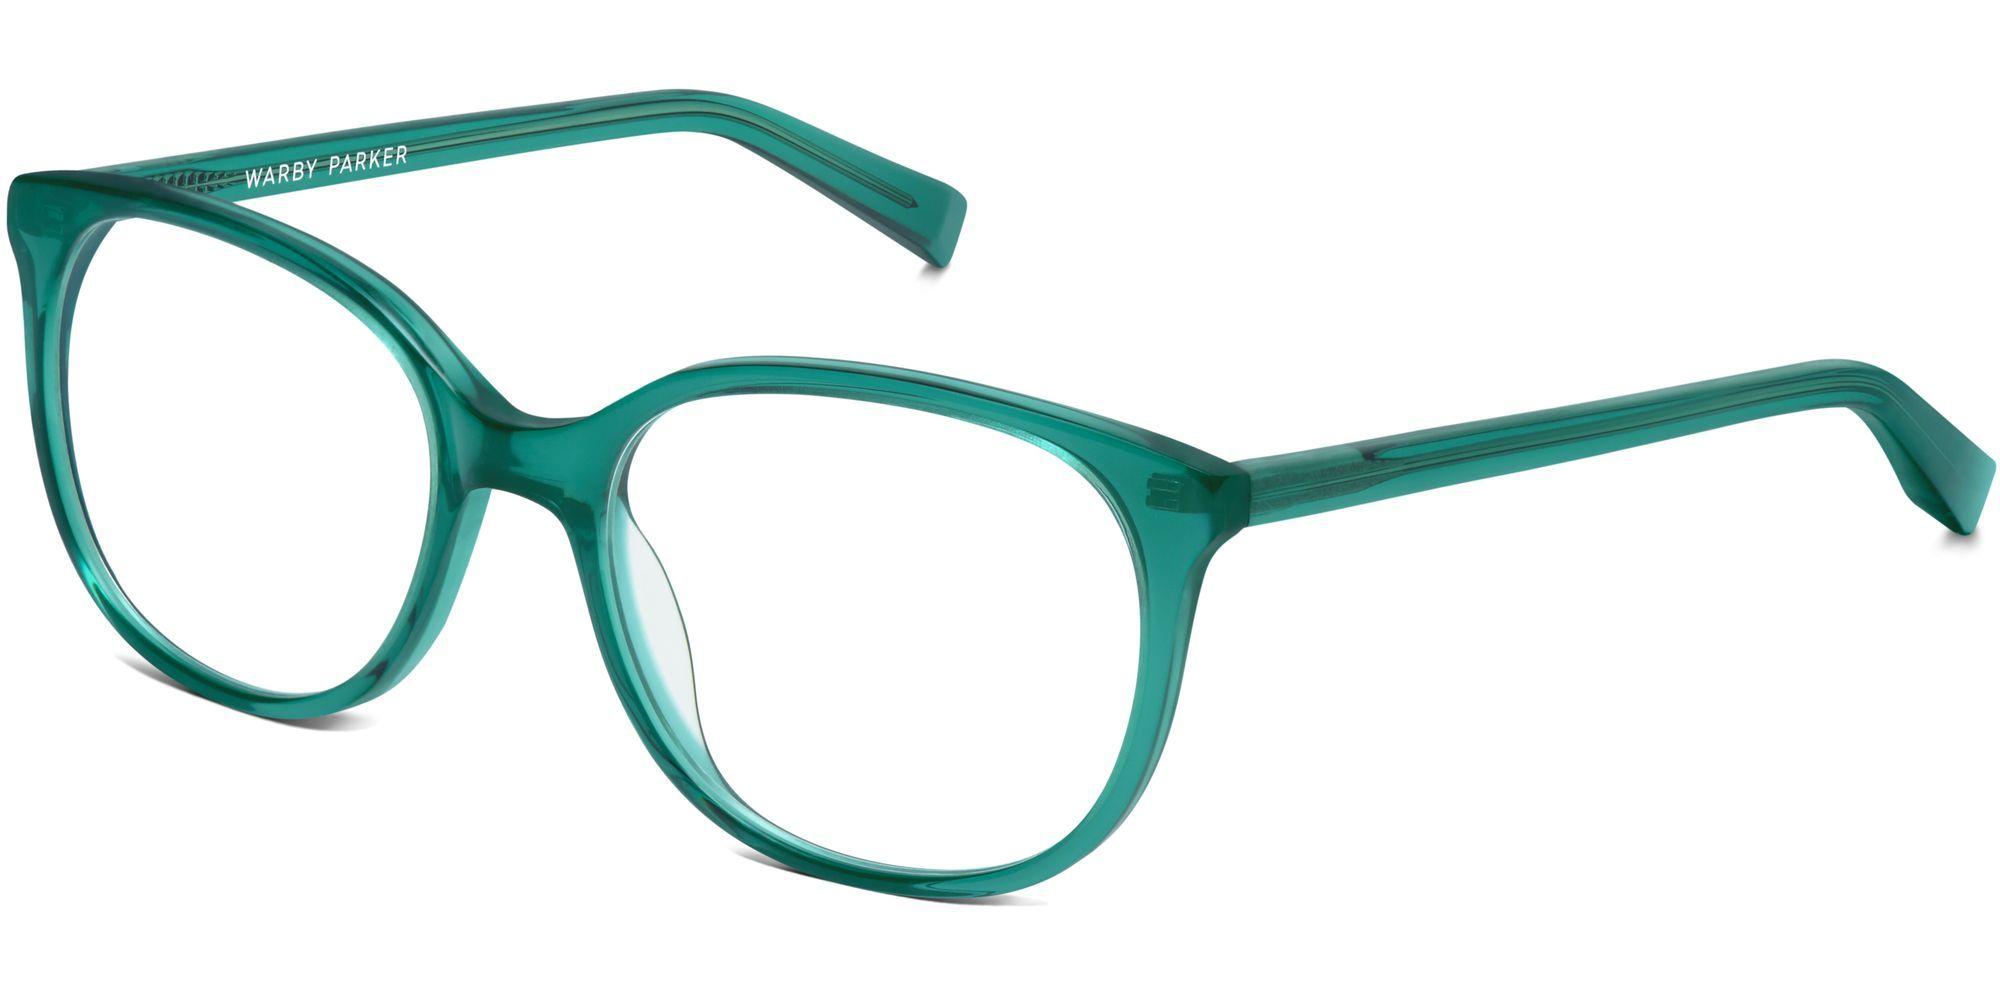 cc3b737563ad Angle of Laurel in Peacock Green // warbyparker Eye Glasses Online, Online  Eyeglasses,